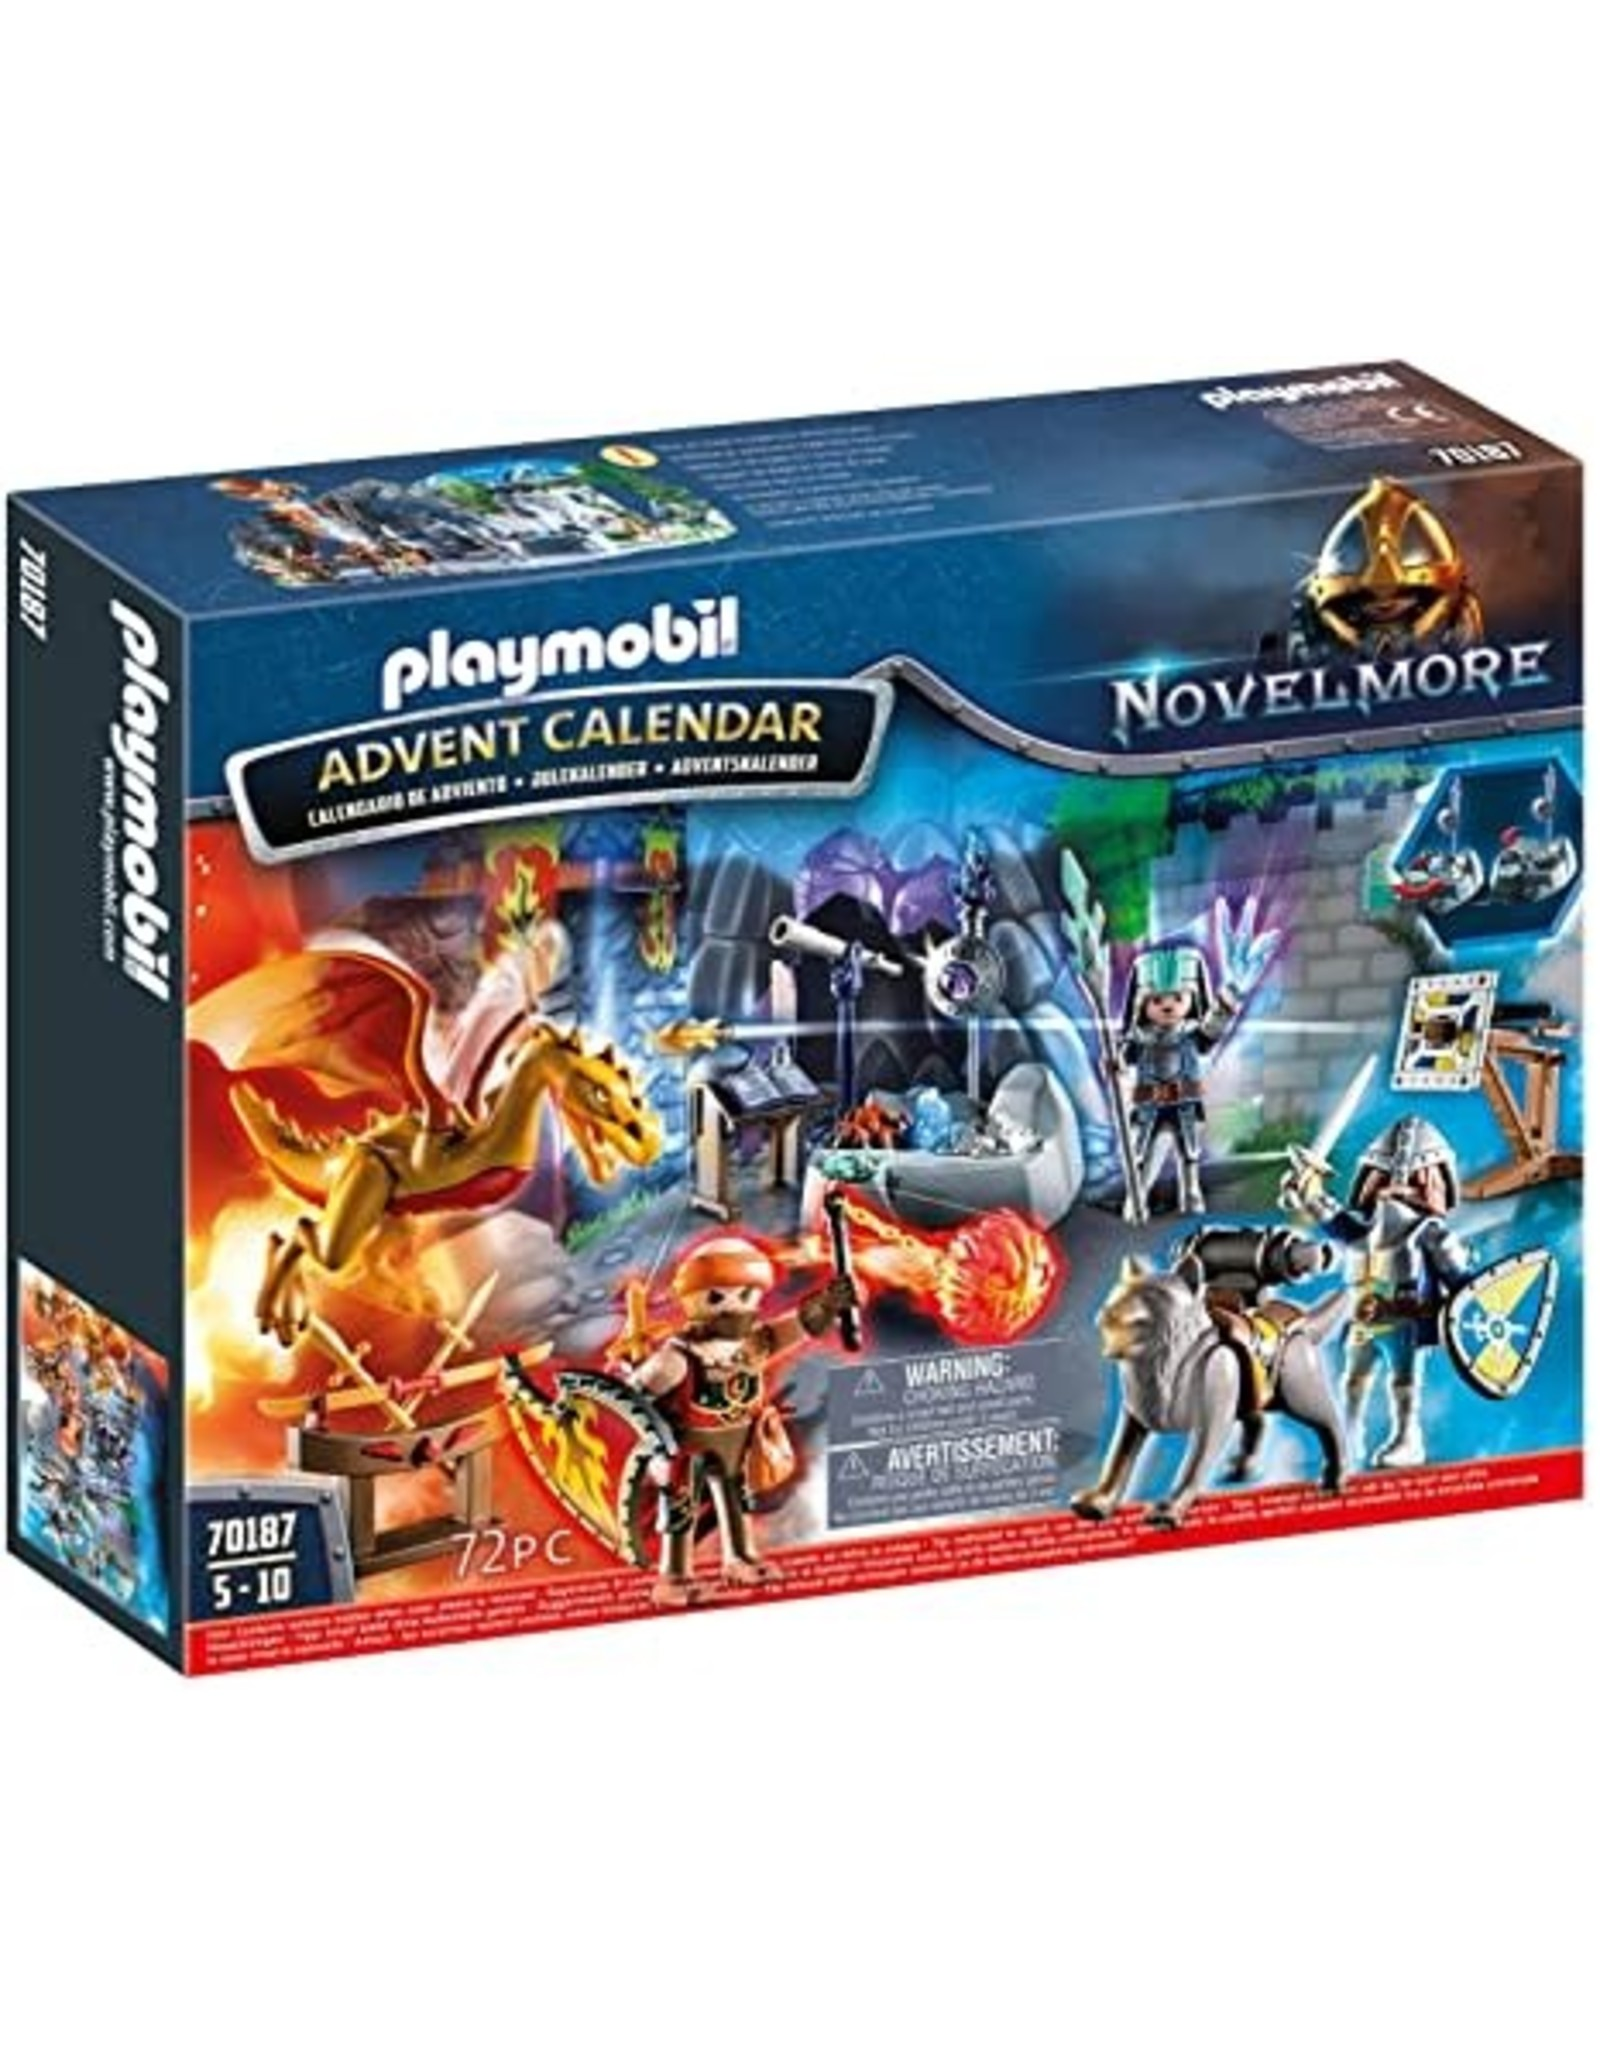 Playmobil Advent Calendar Battle for the Magic Stone